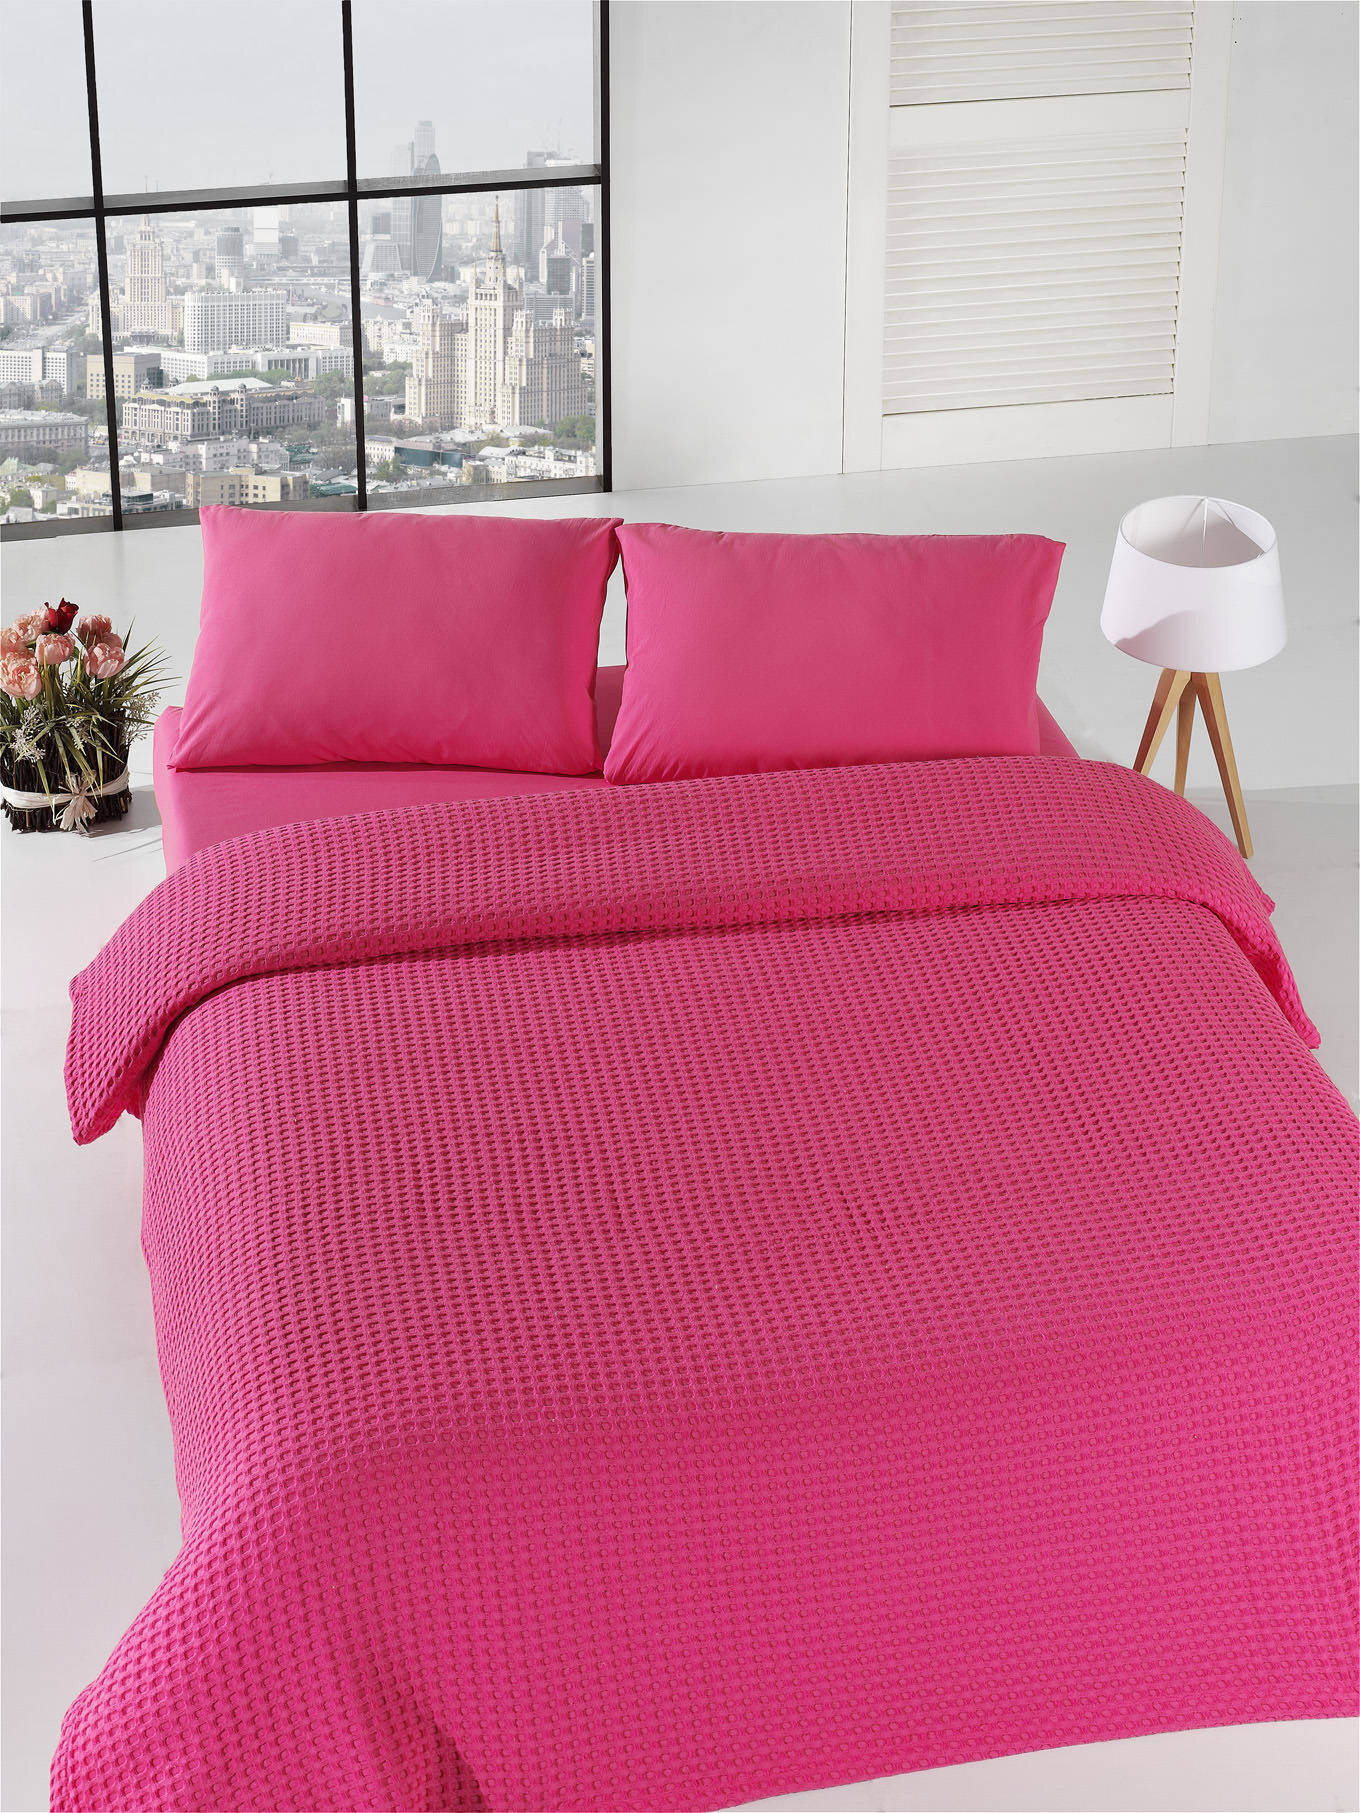 Cuvertura de pat, Eponj Home, material: 100% bumbac, 143EPJ5607